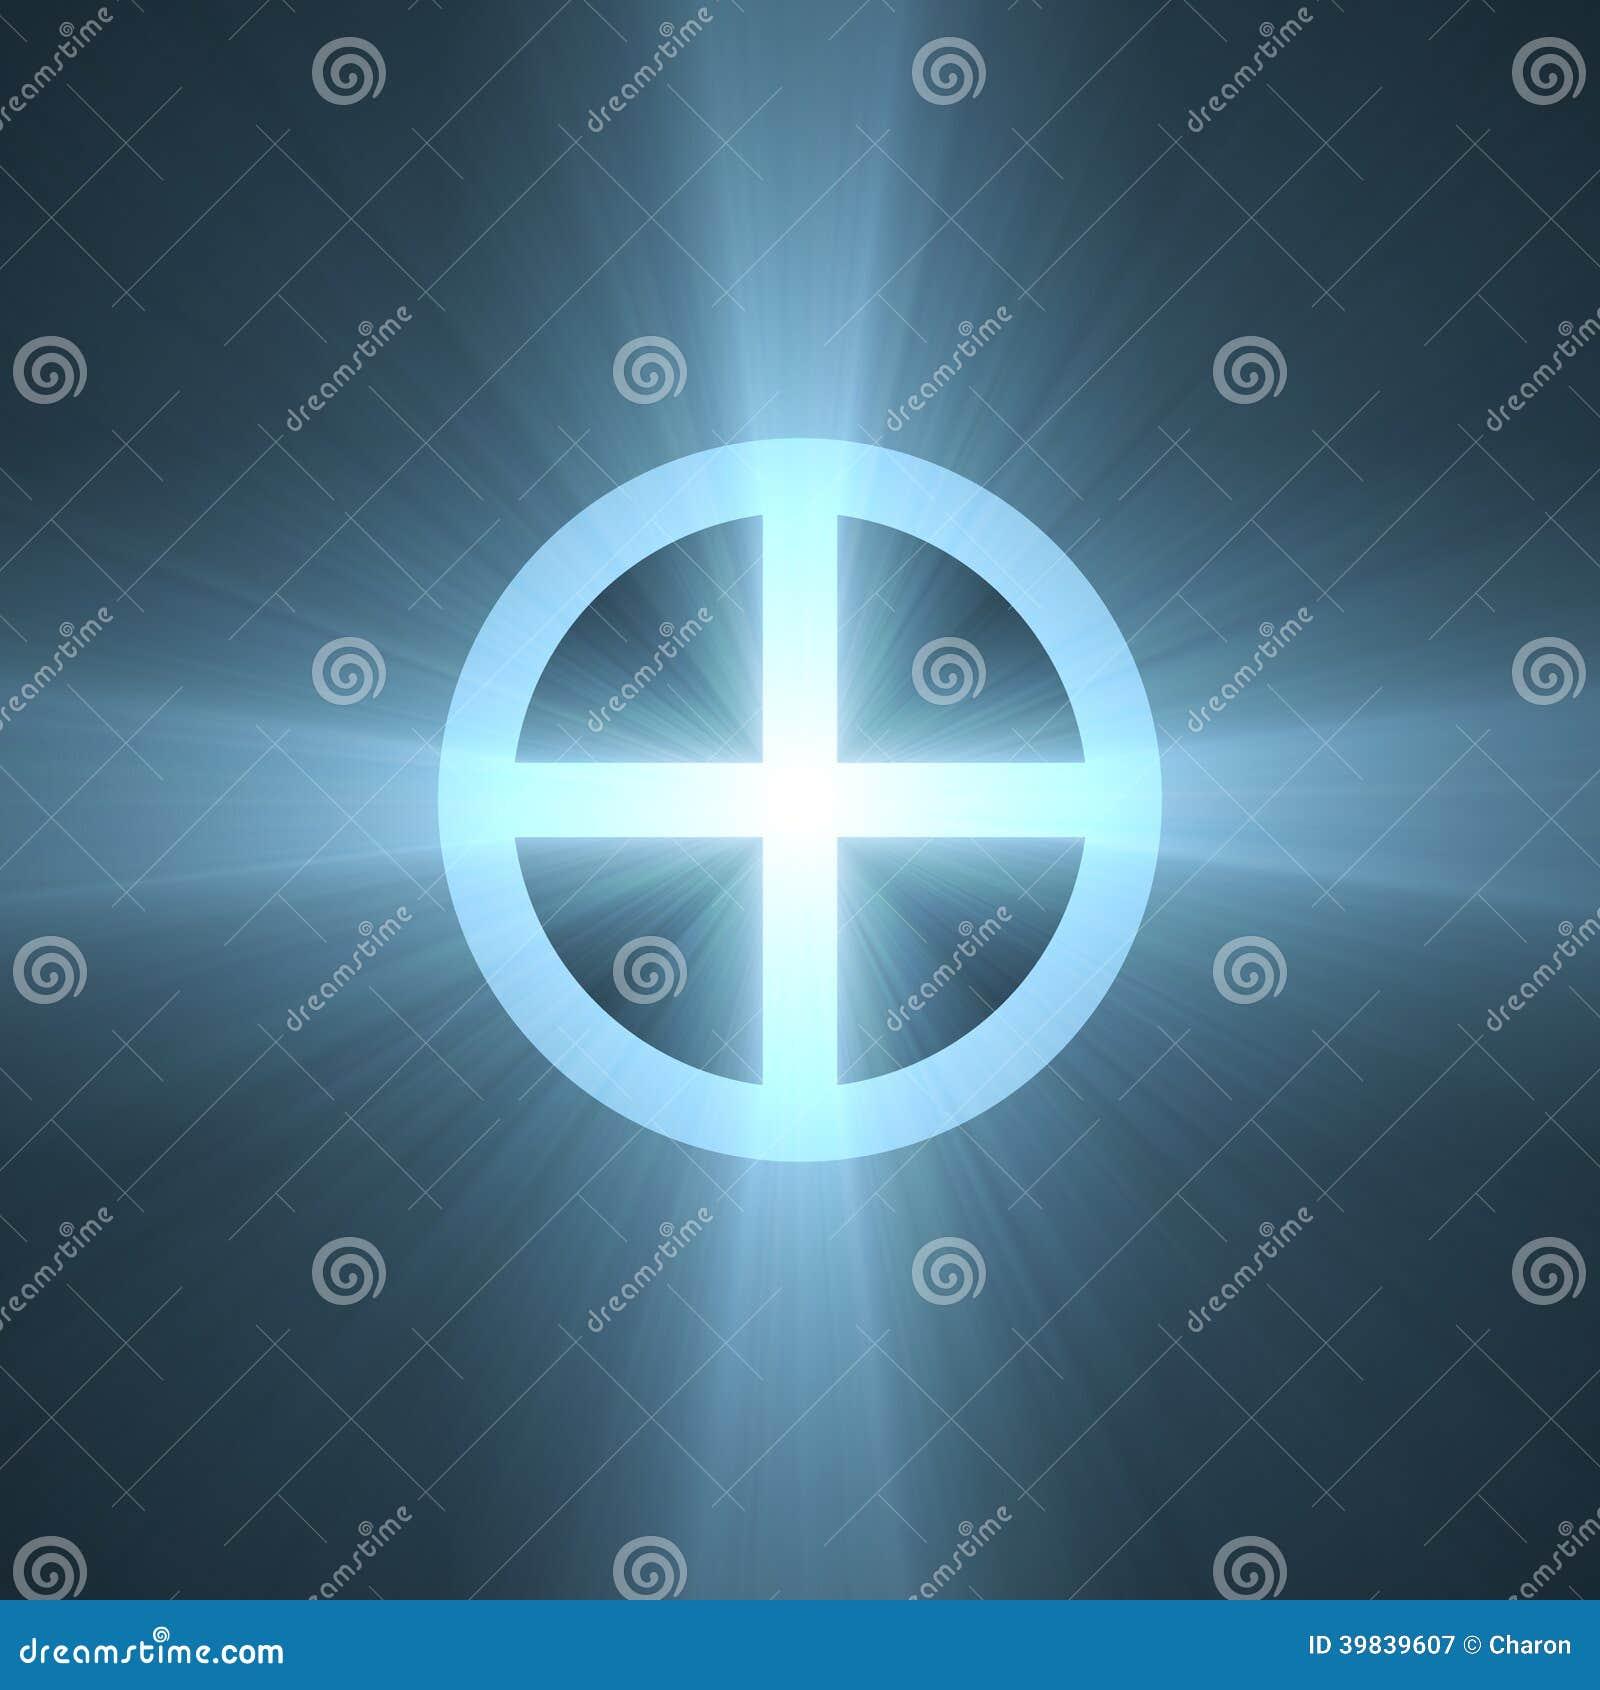 Planet Earth Sign Cross Circle Halo Stock Illustration